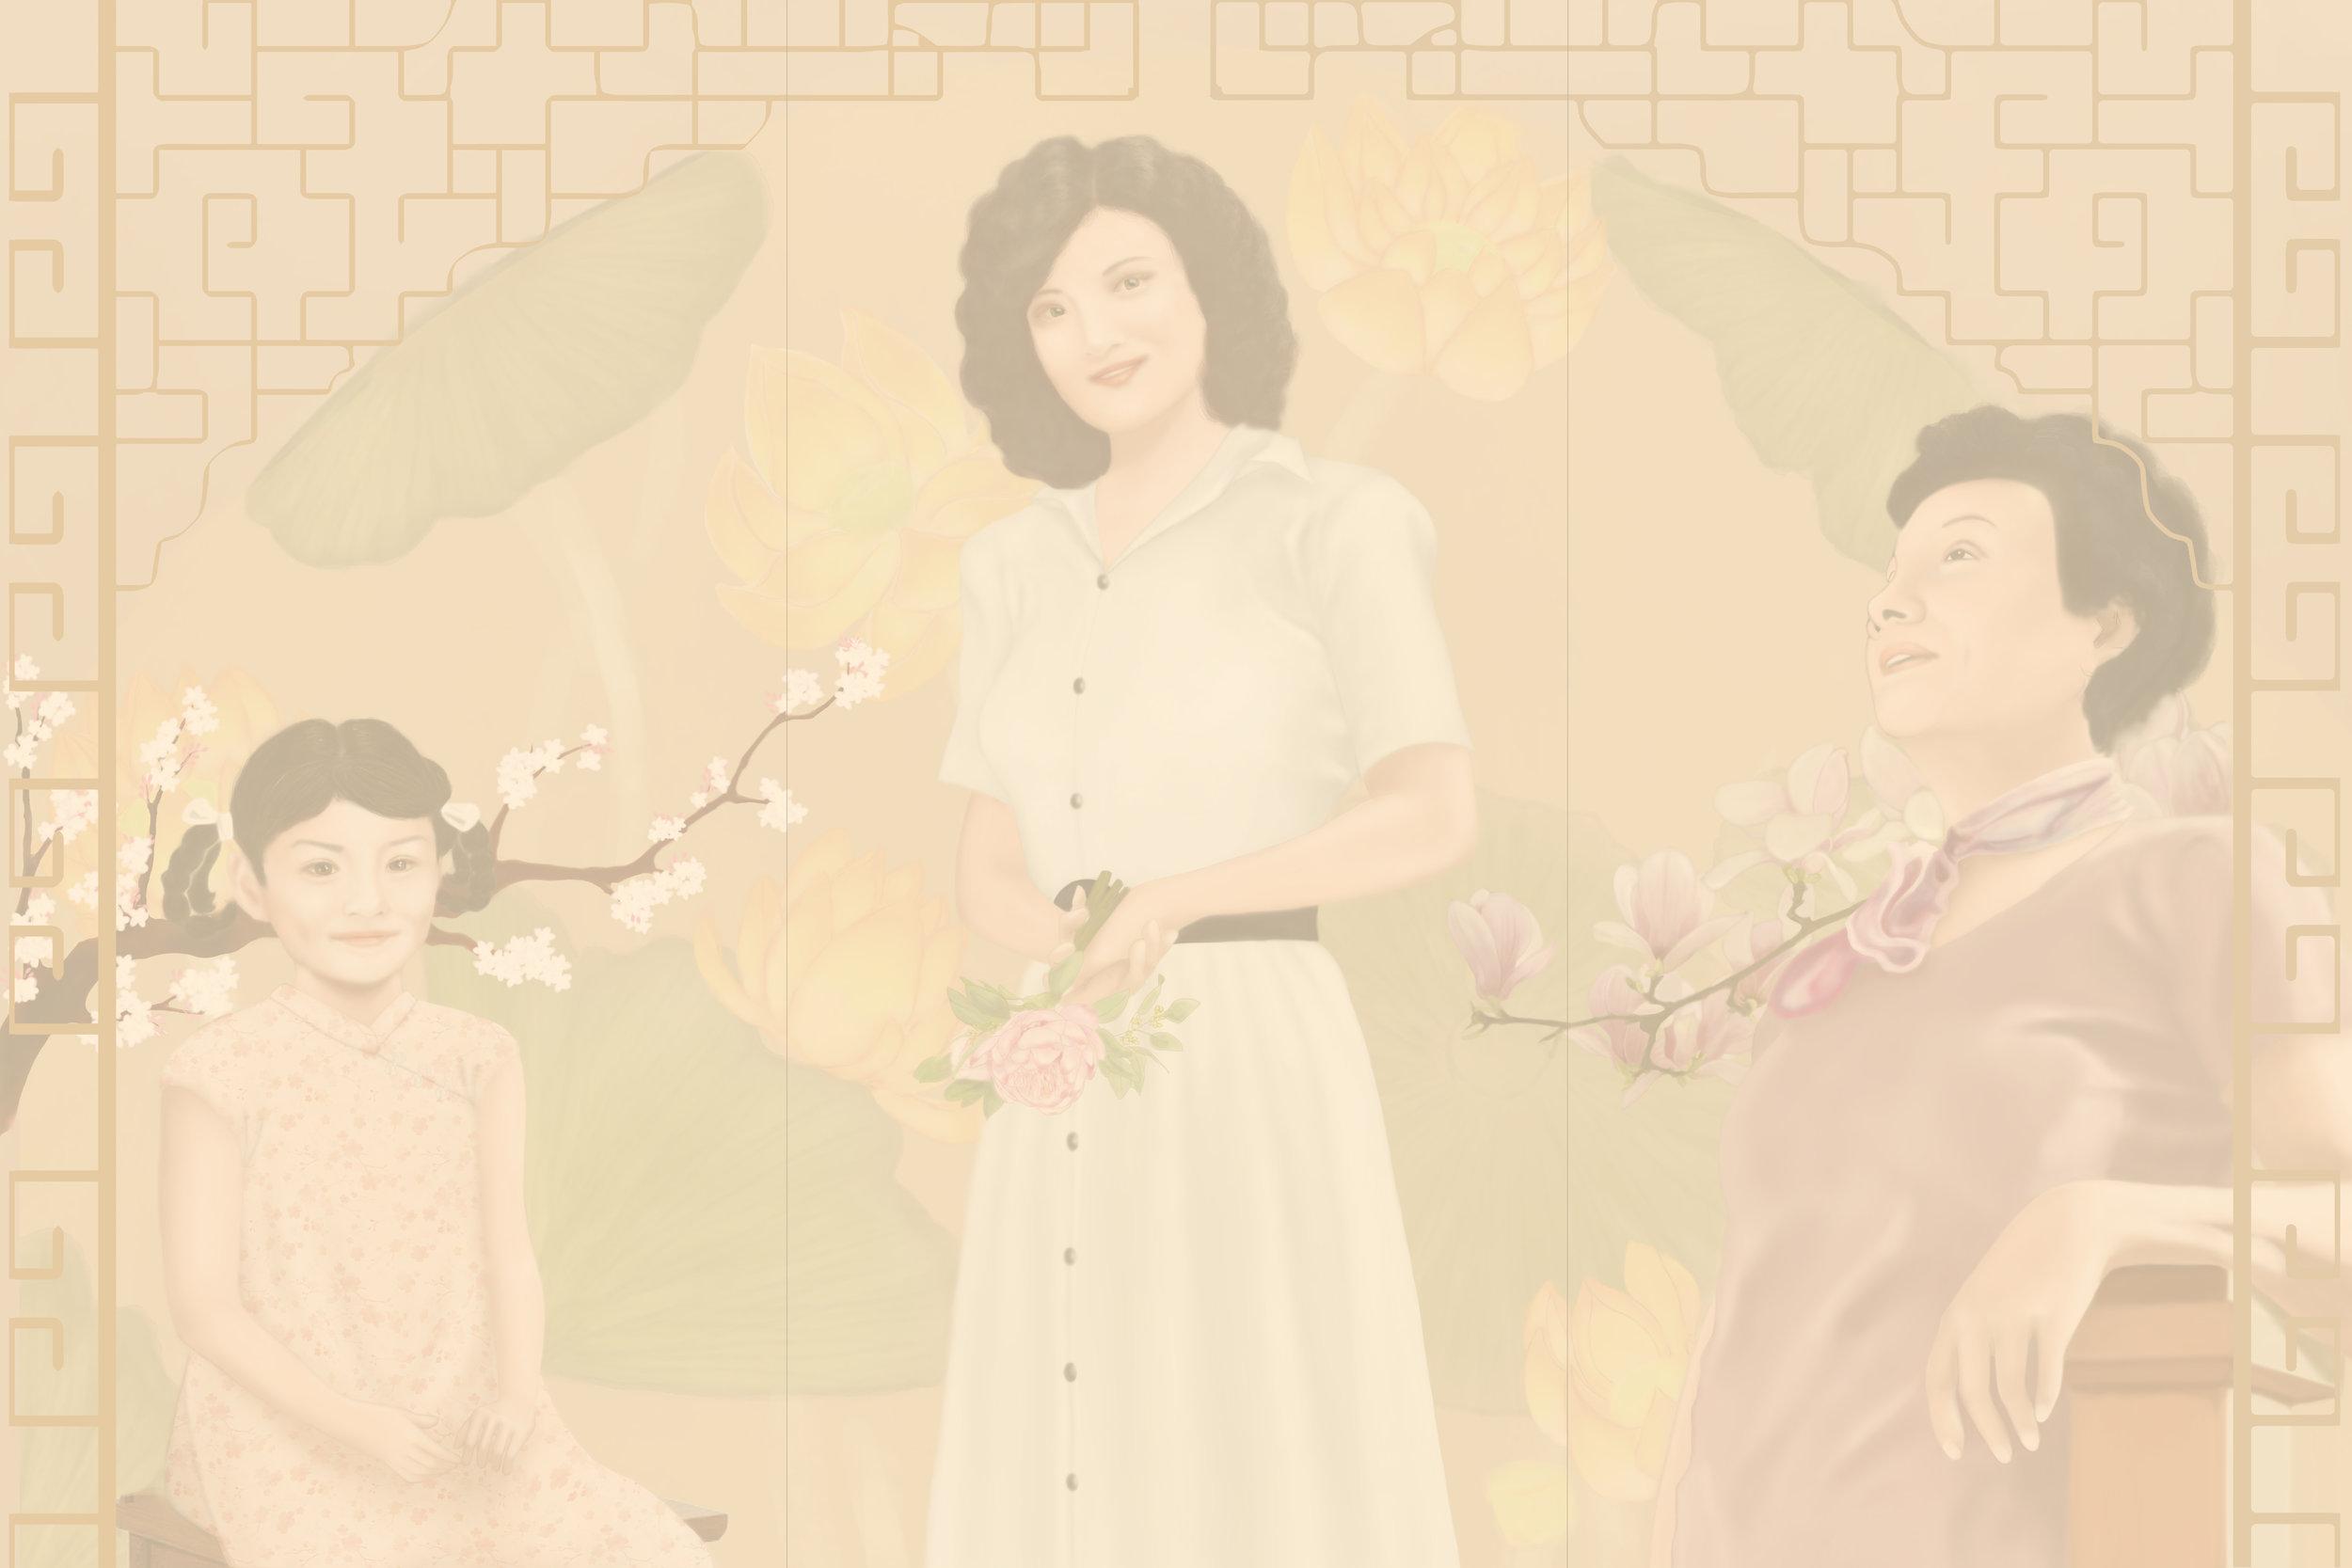 Joy Triptych - Work in Progress